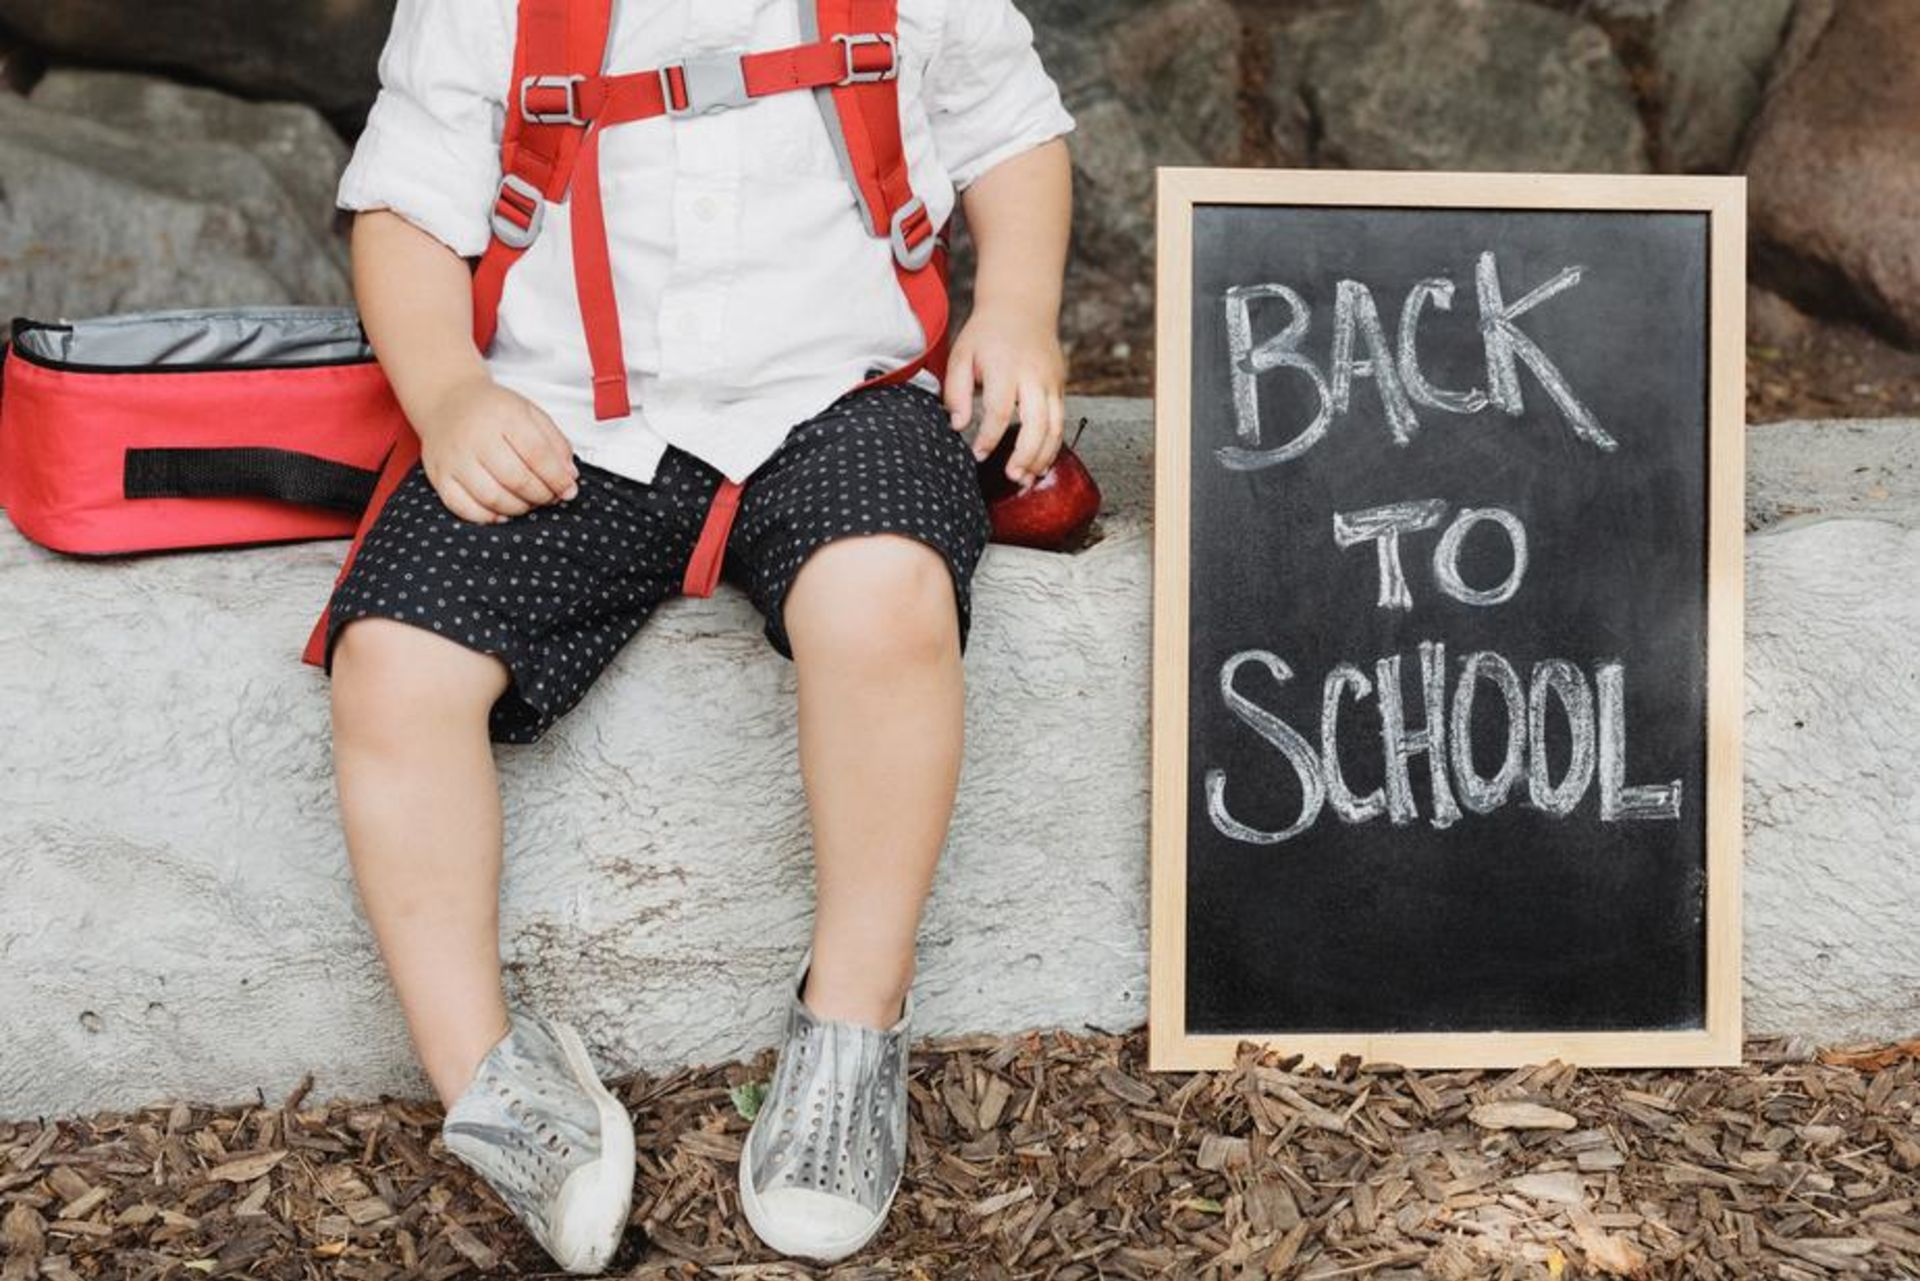 School Starting Dates In The OKC Metro Area